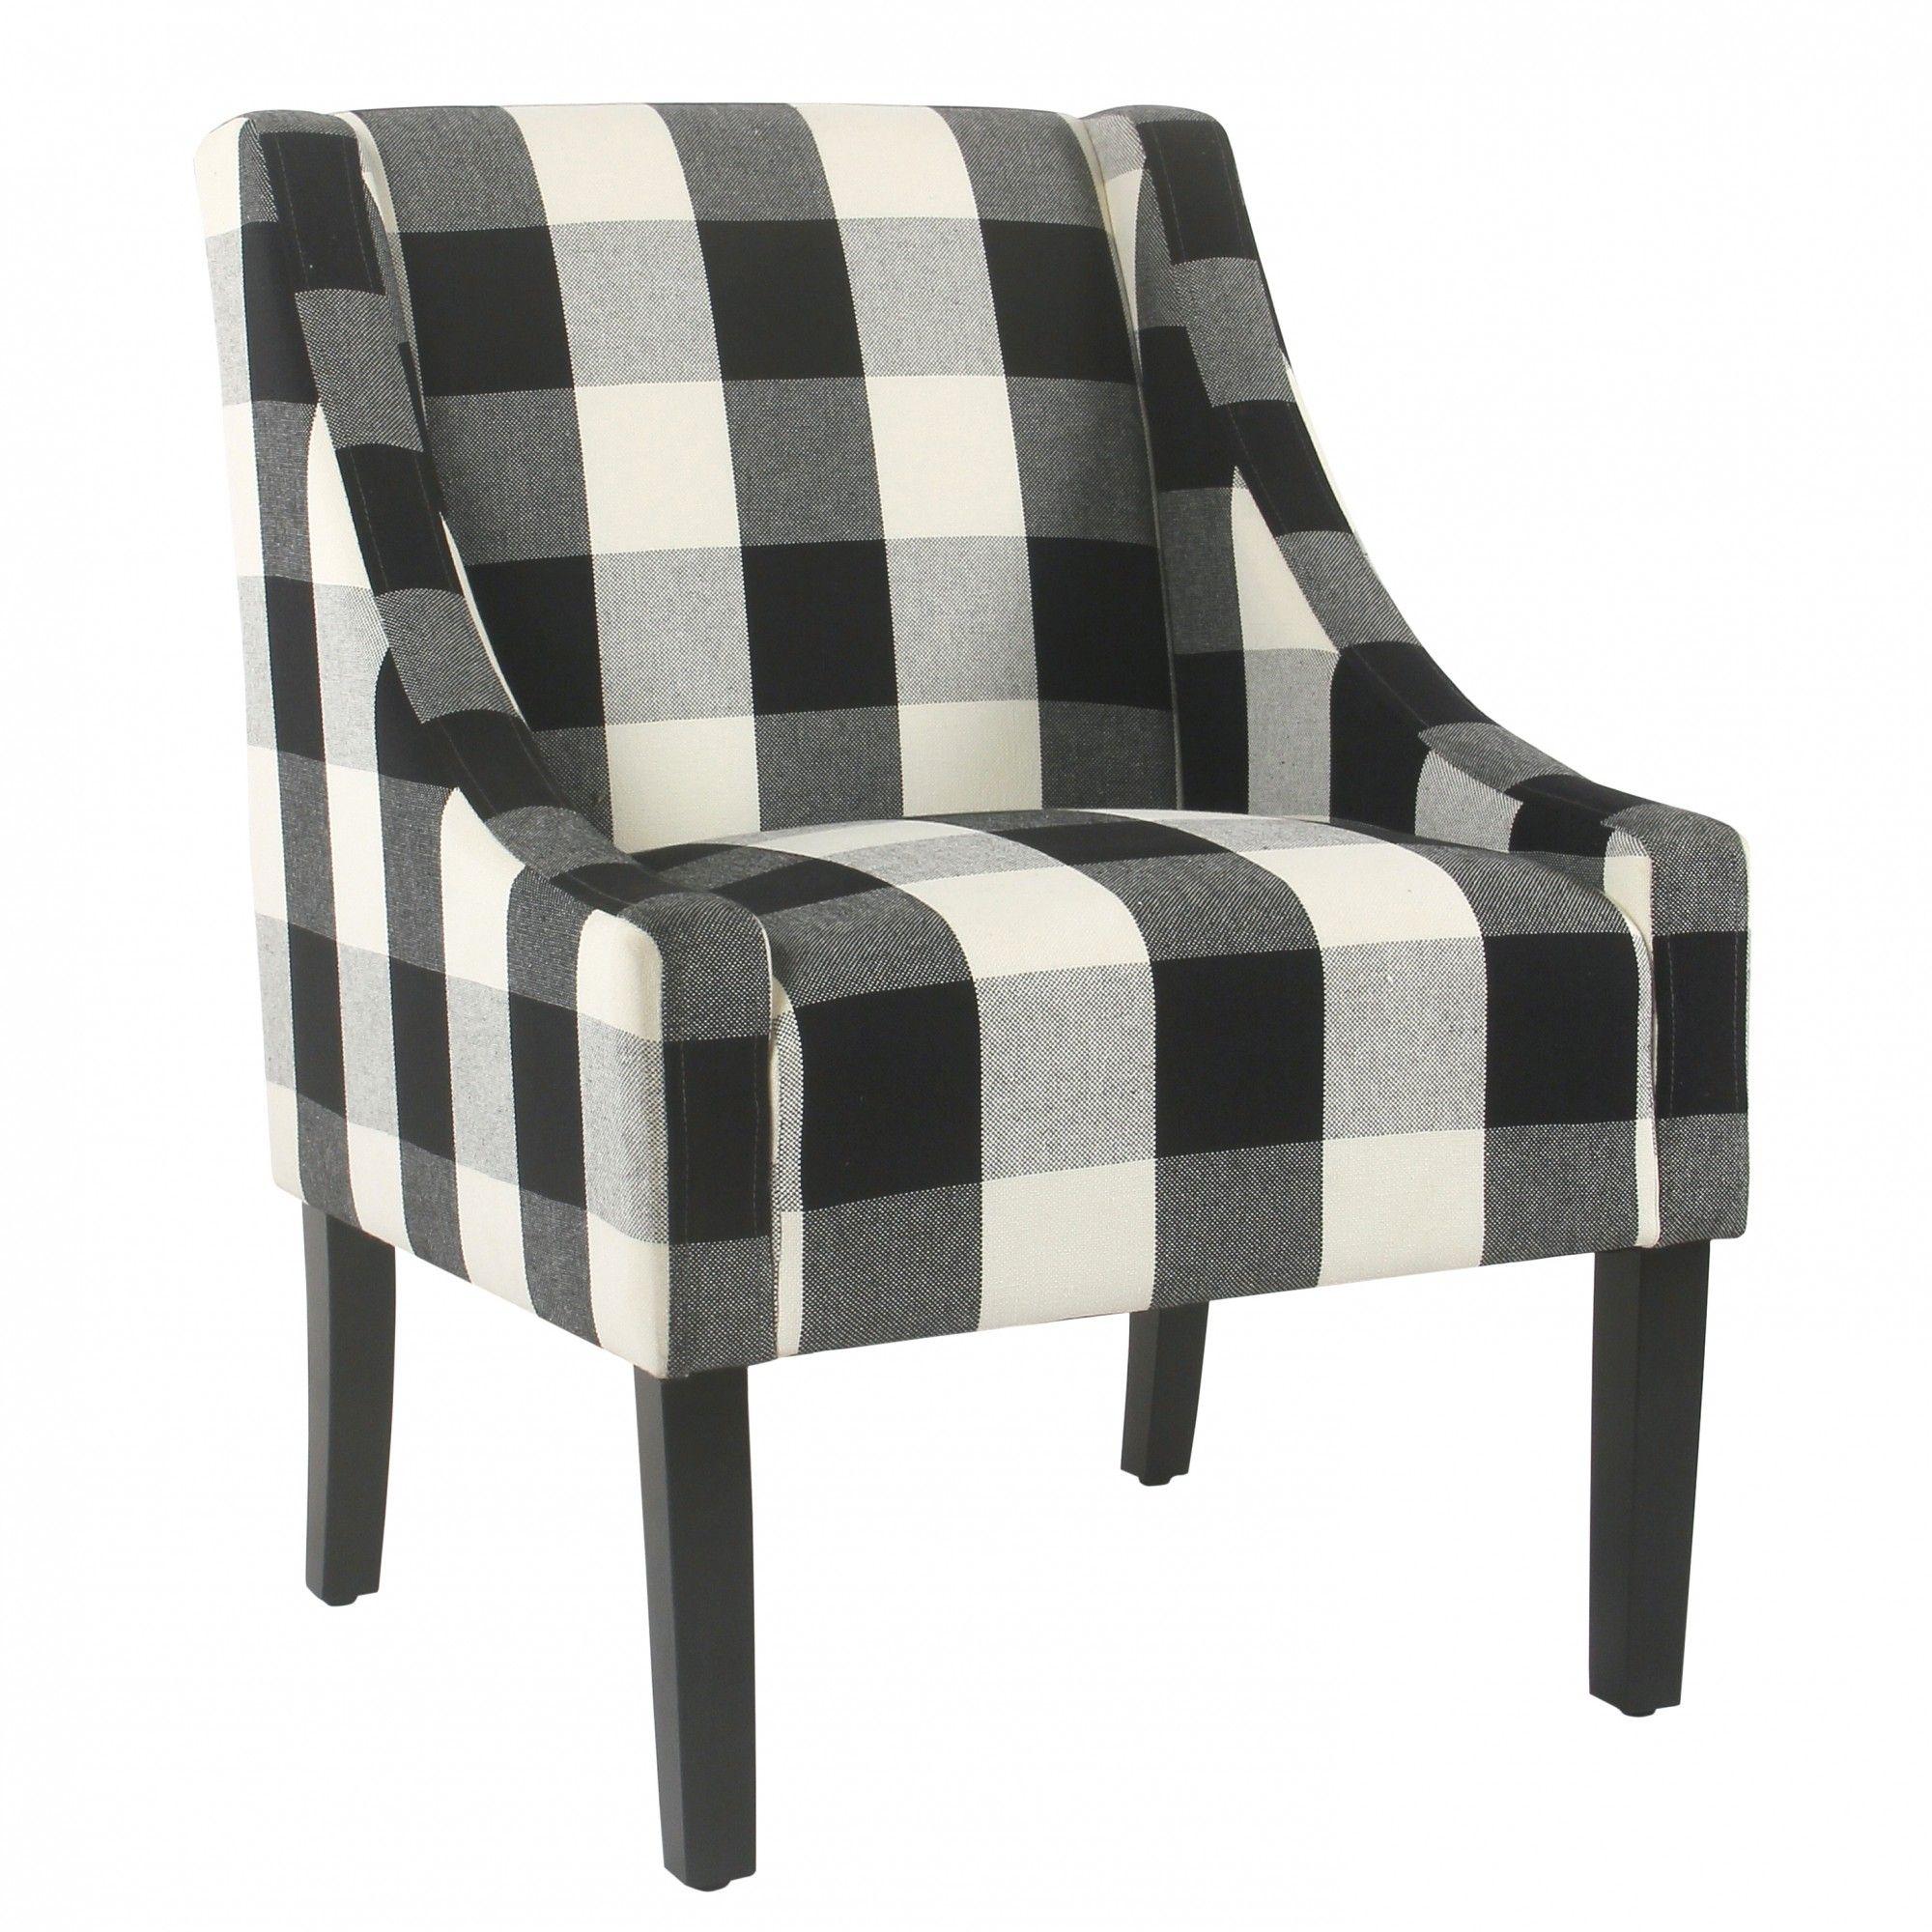 Modern Swoop Accent Chair Black Plaid Plaid Chair Accent